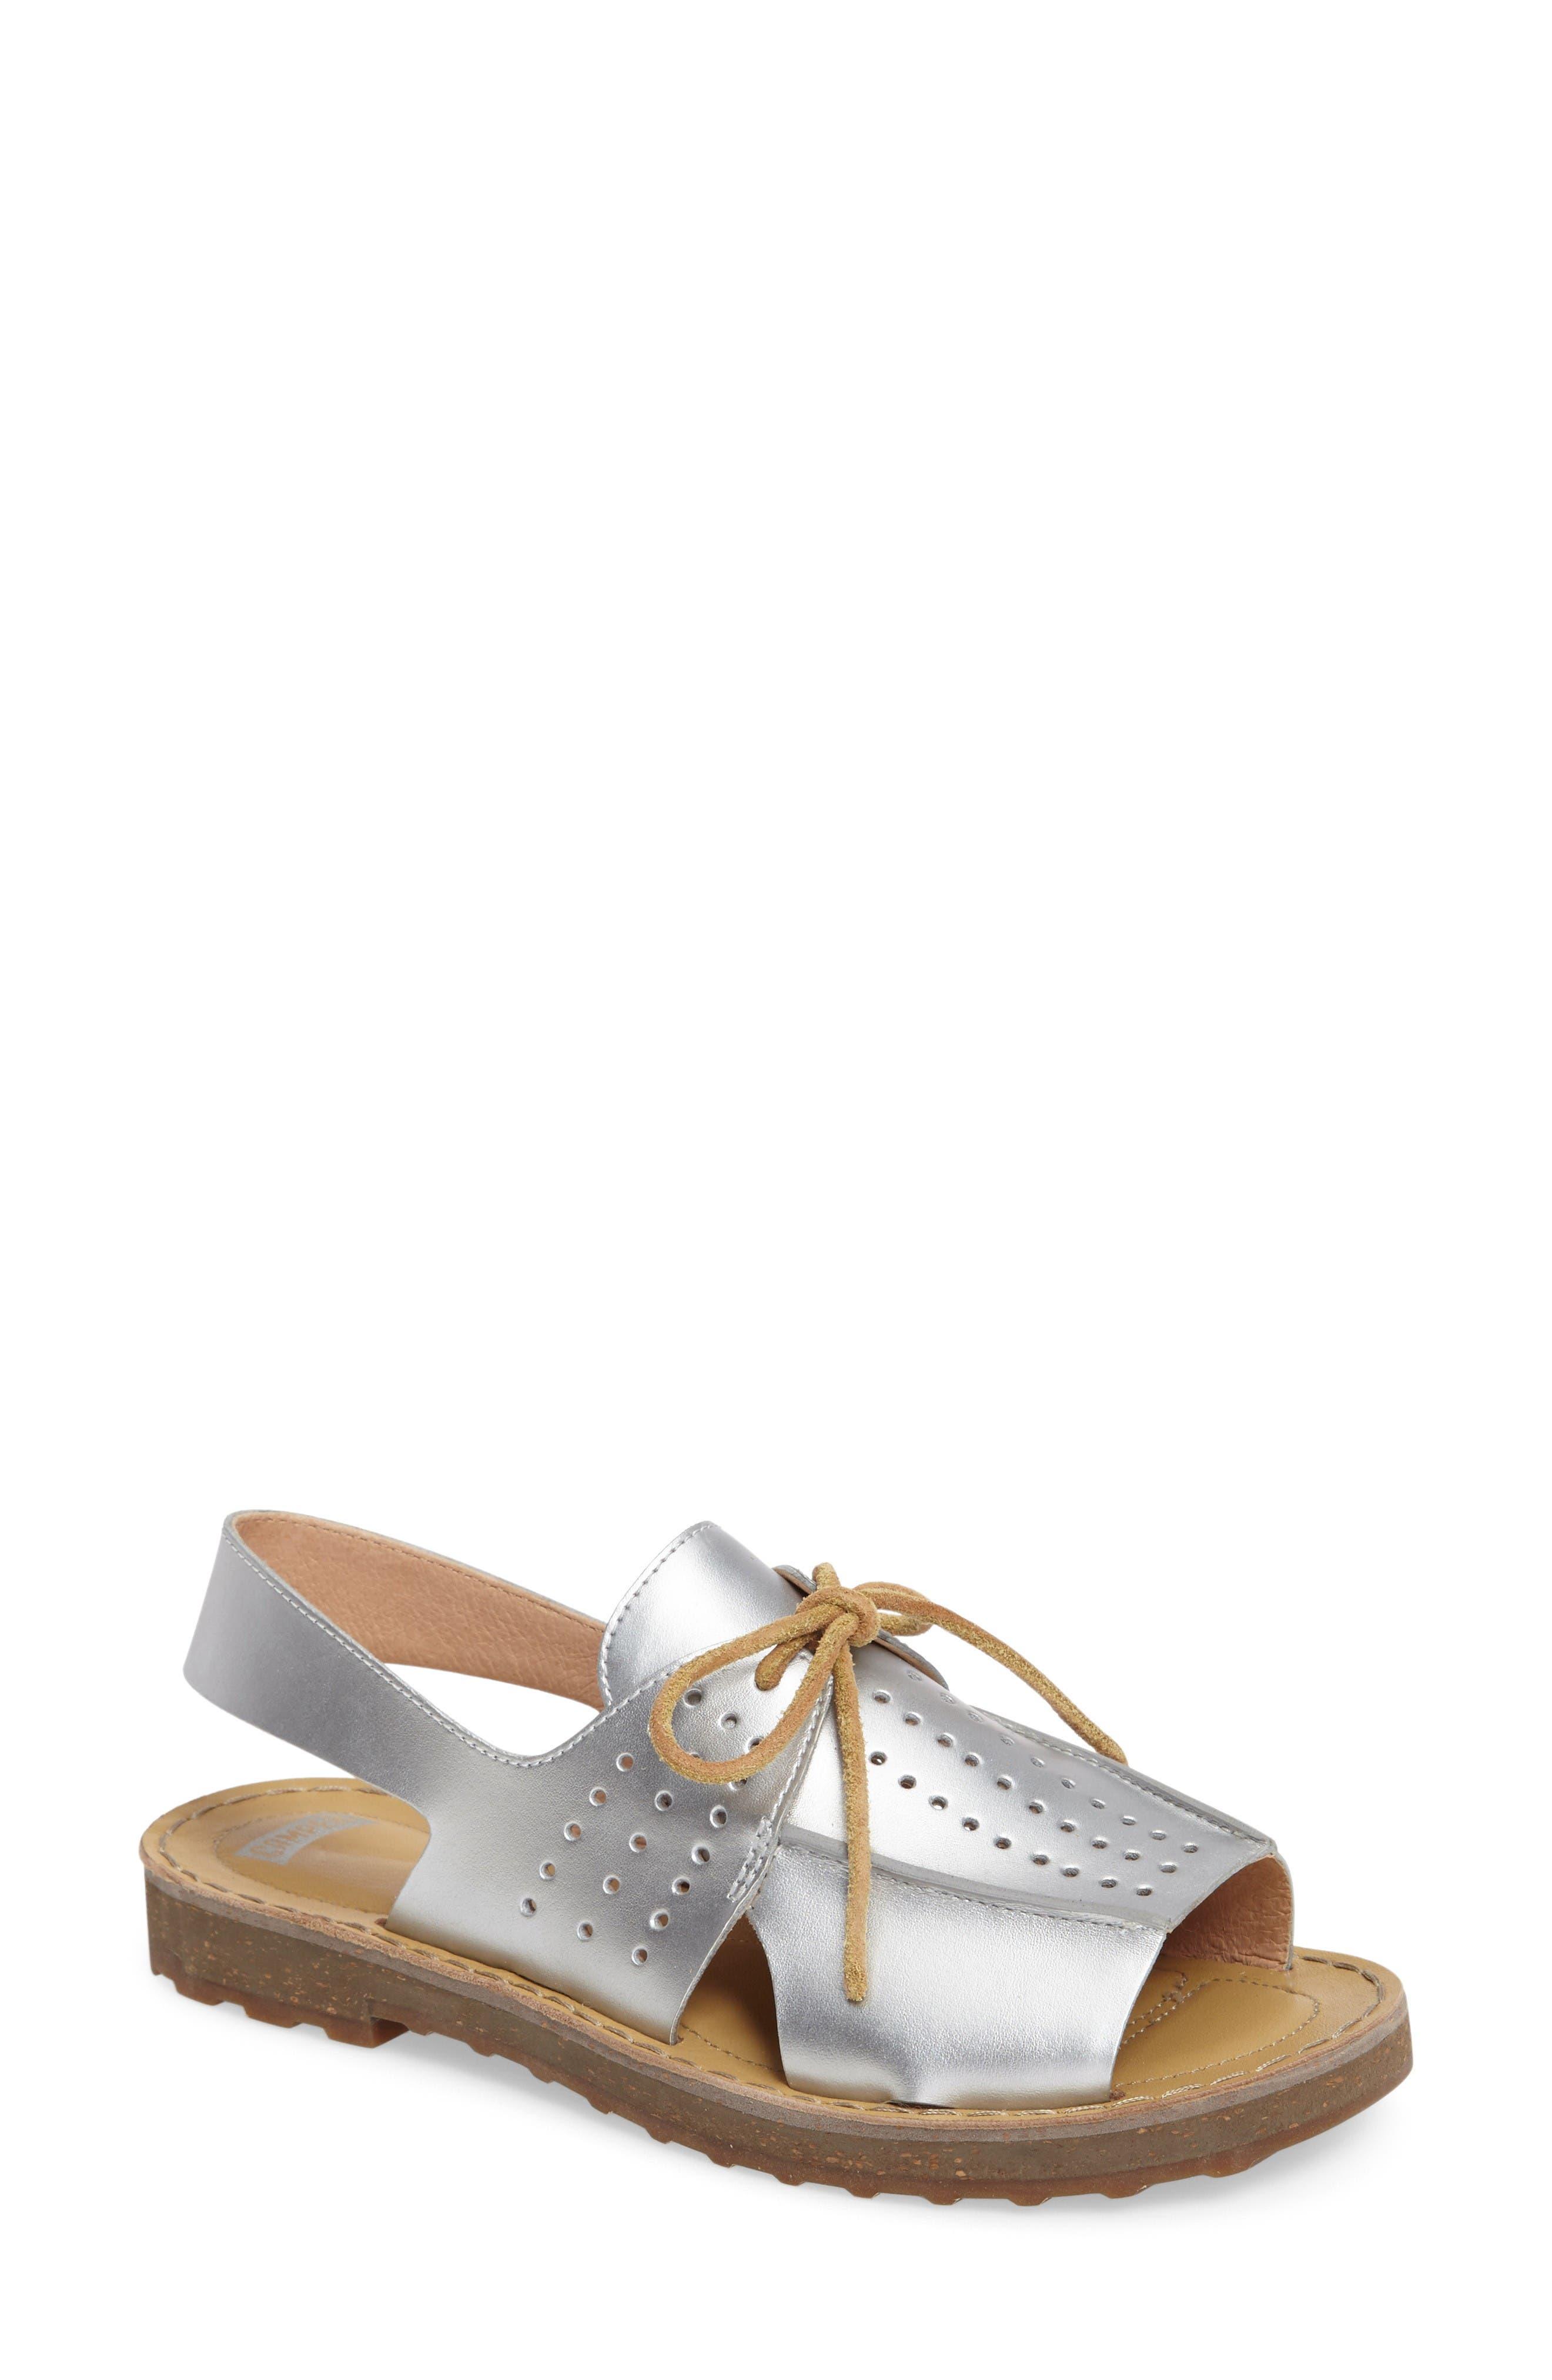 Main Image - Camper Lace-Up Sandal (Women)